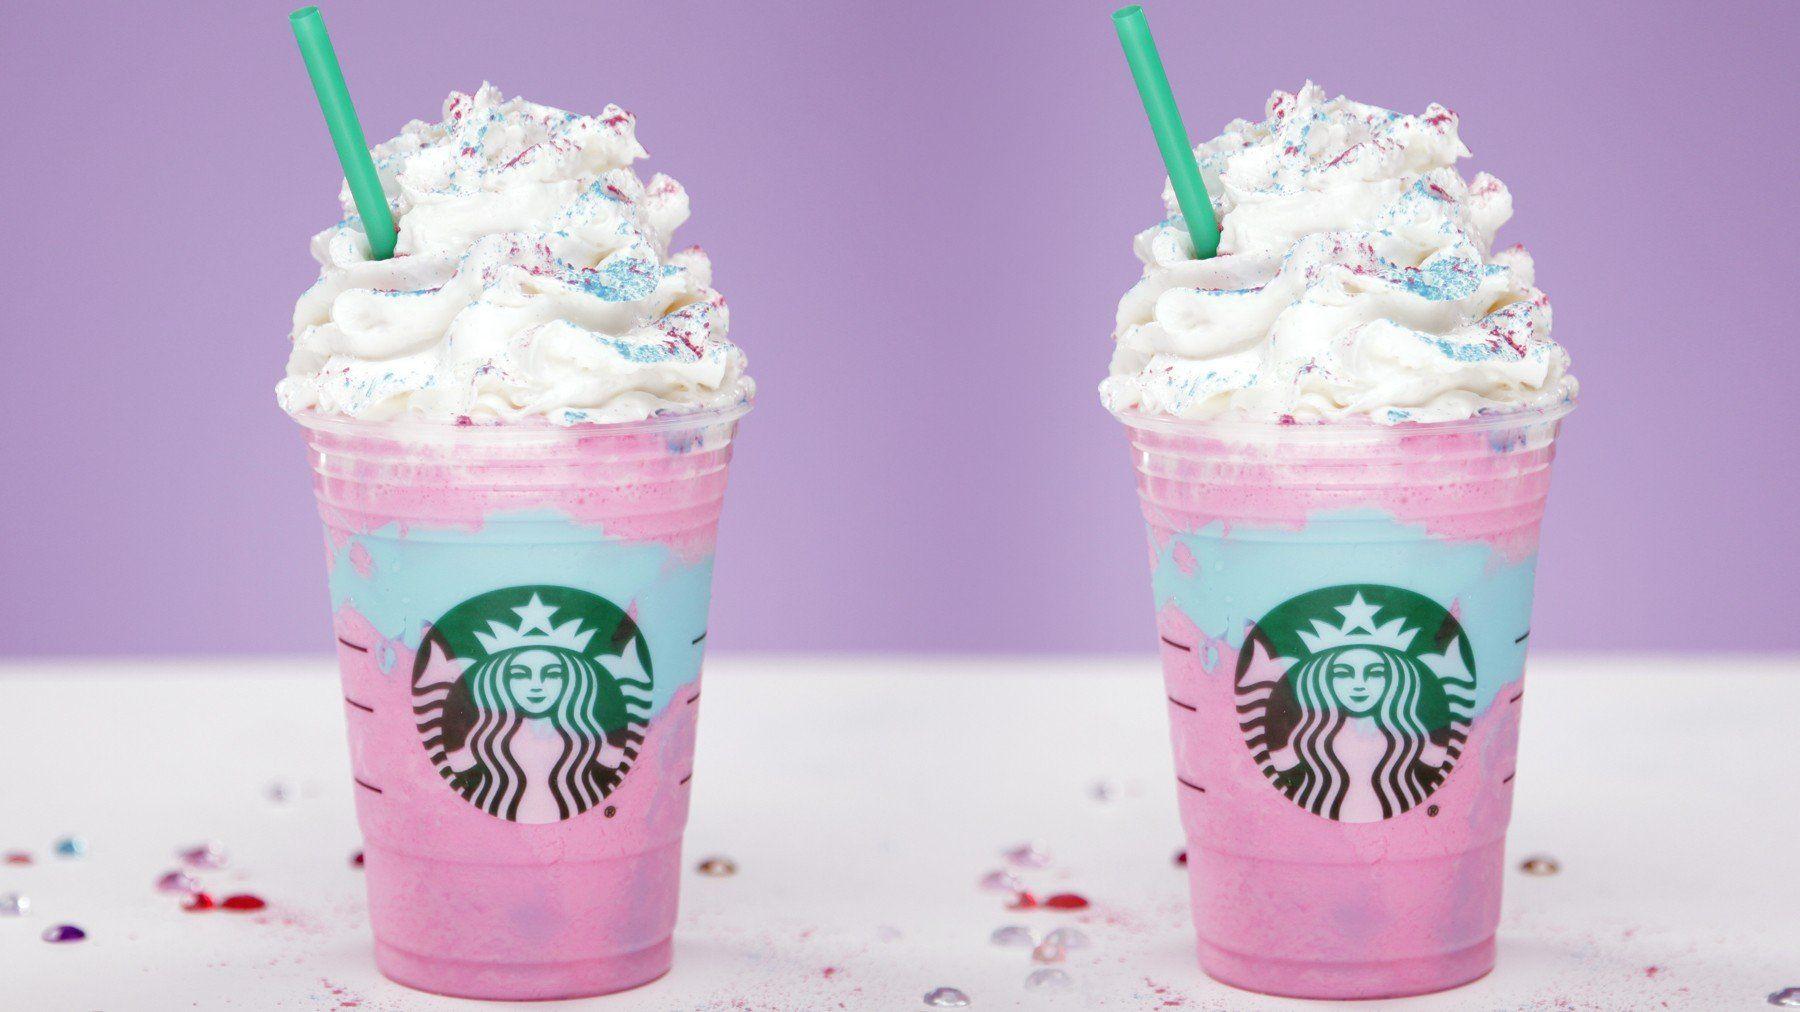 We Hacked Starbucks's Unicorn Frappuccino